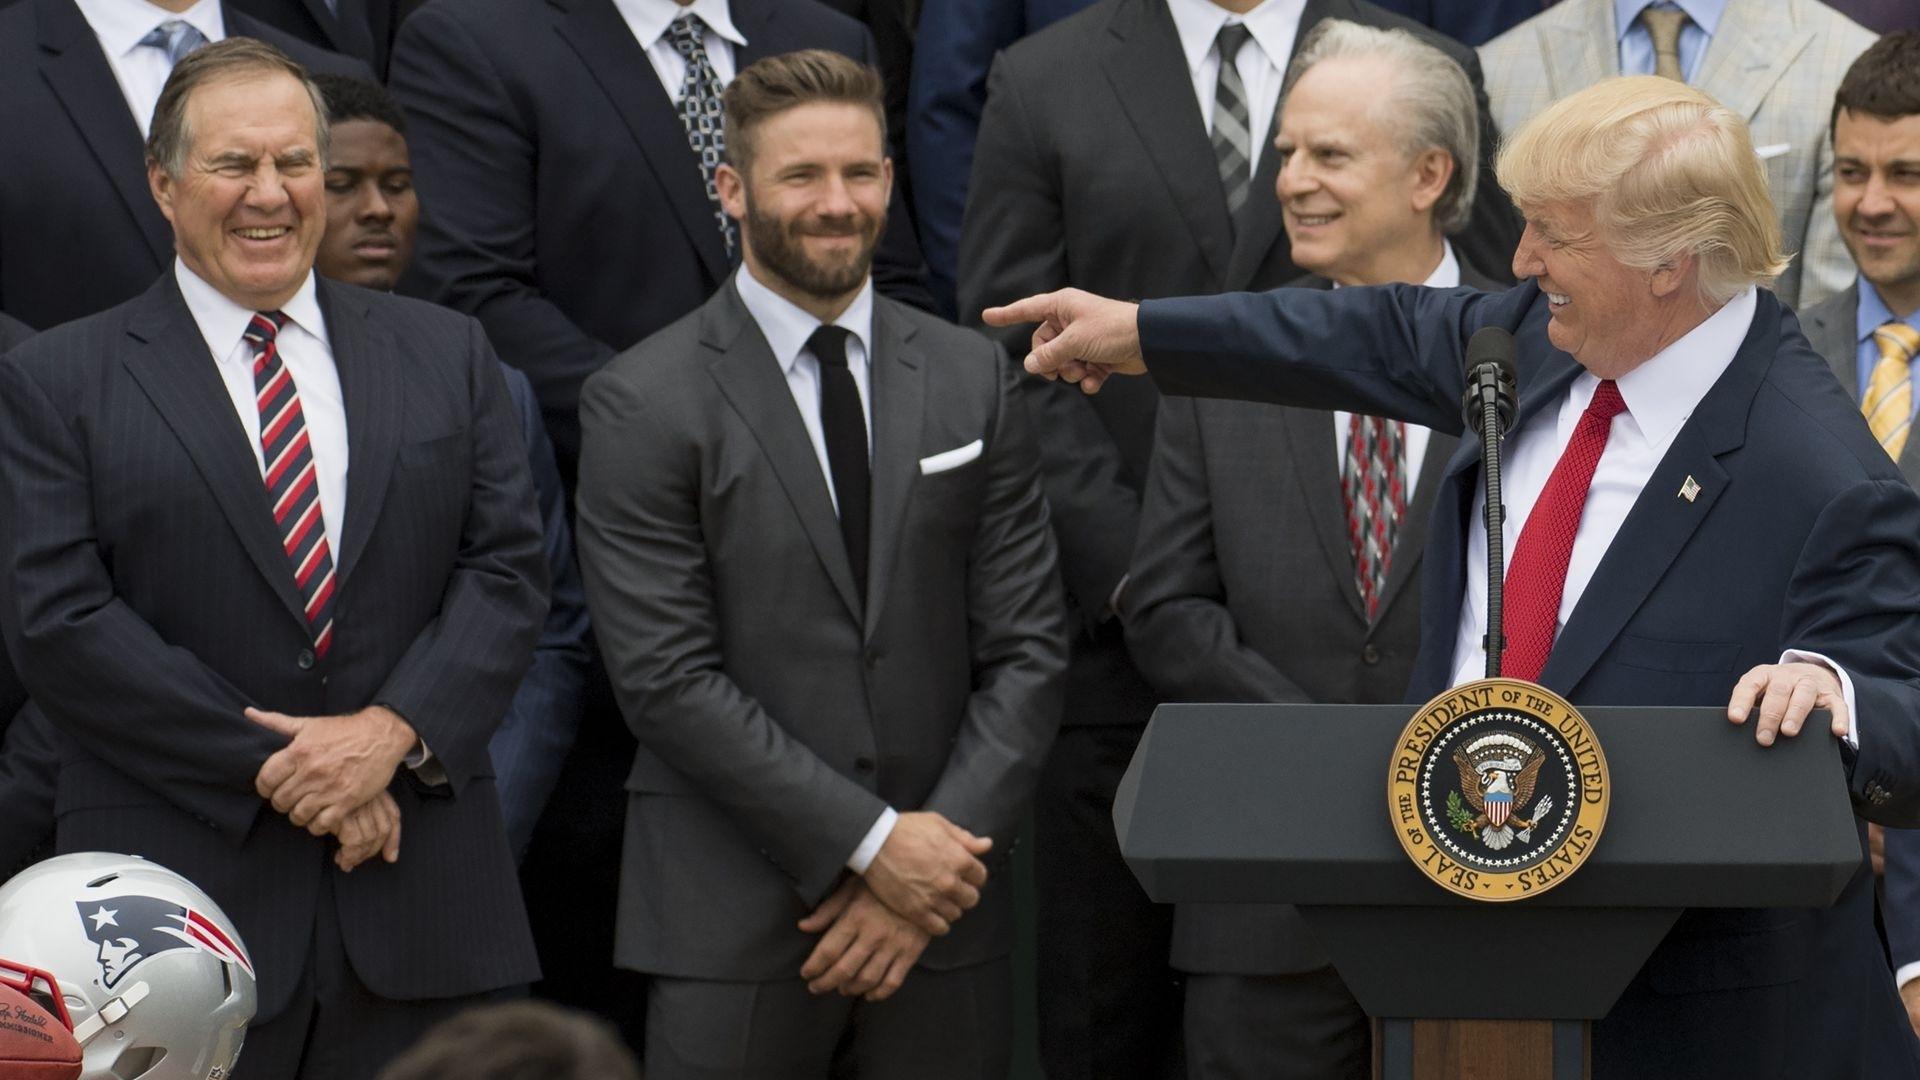 Trump Picks Patriots To Win Super Bowl - Axios with regard to Trump Super Bowl Kraft